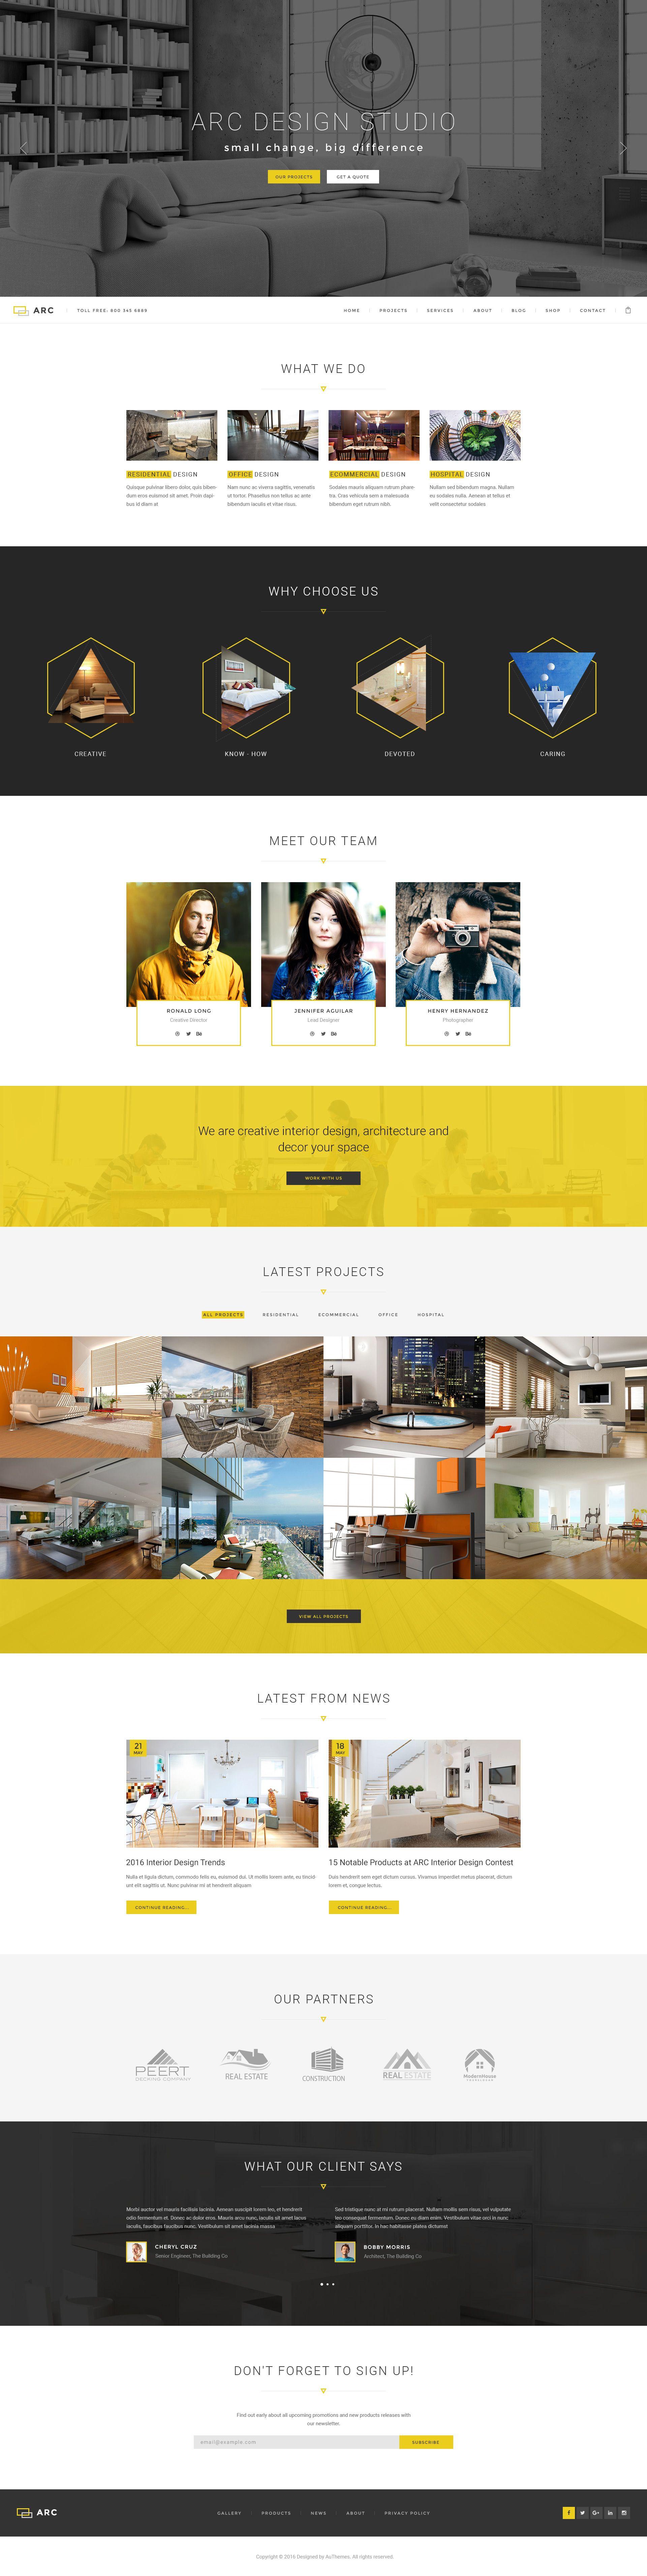 ARC - Interior Design, Decor, Architecture Business PSD Template ...